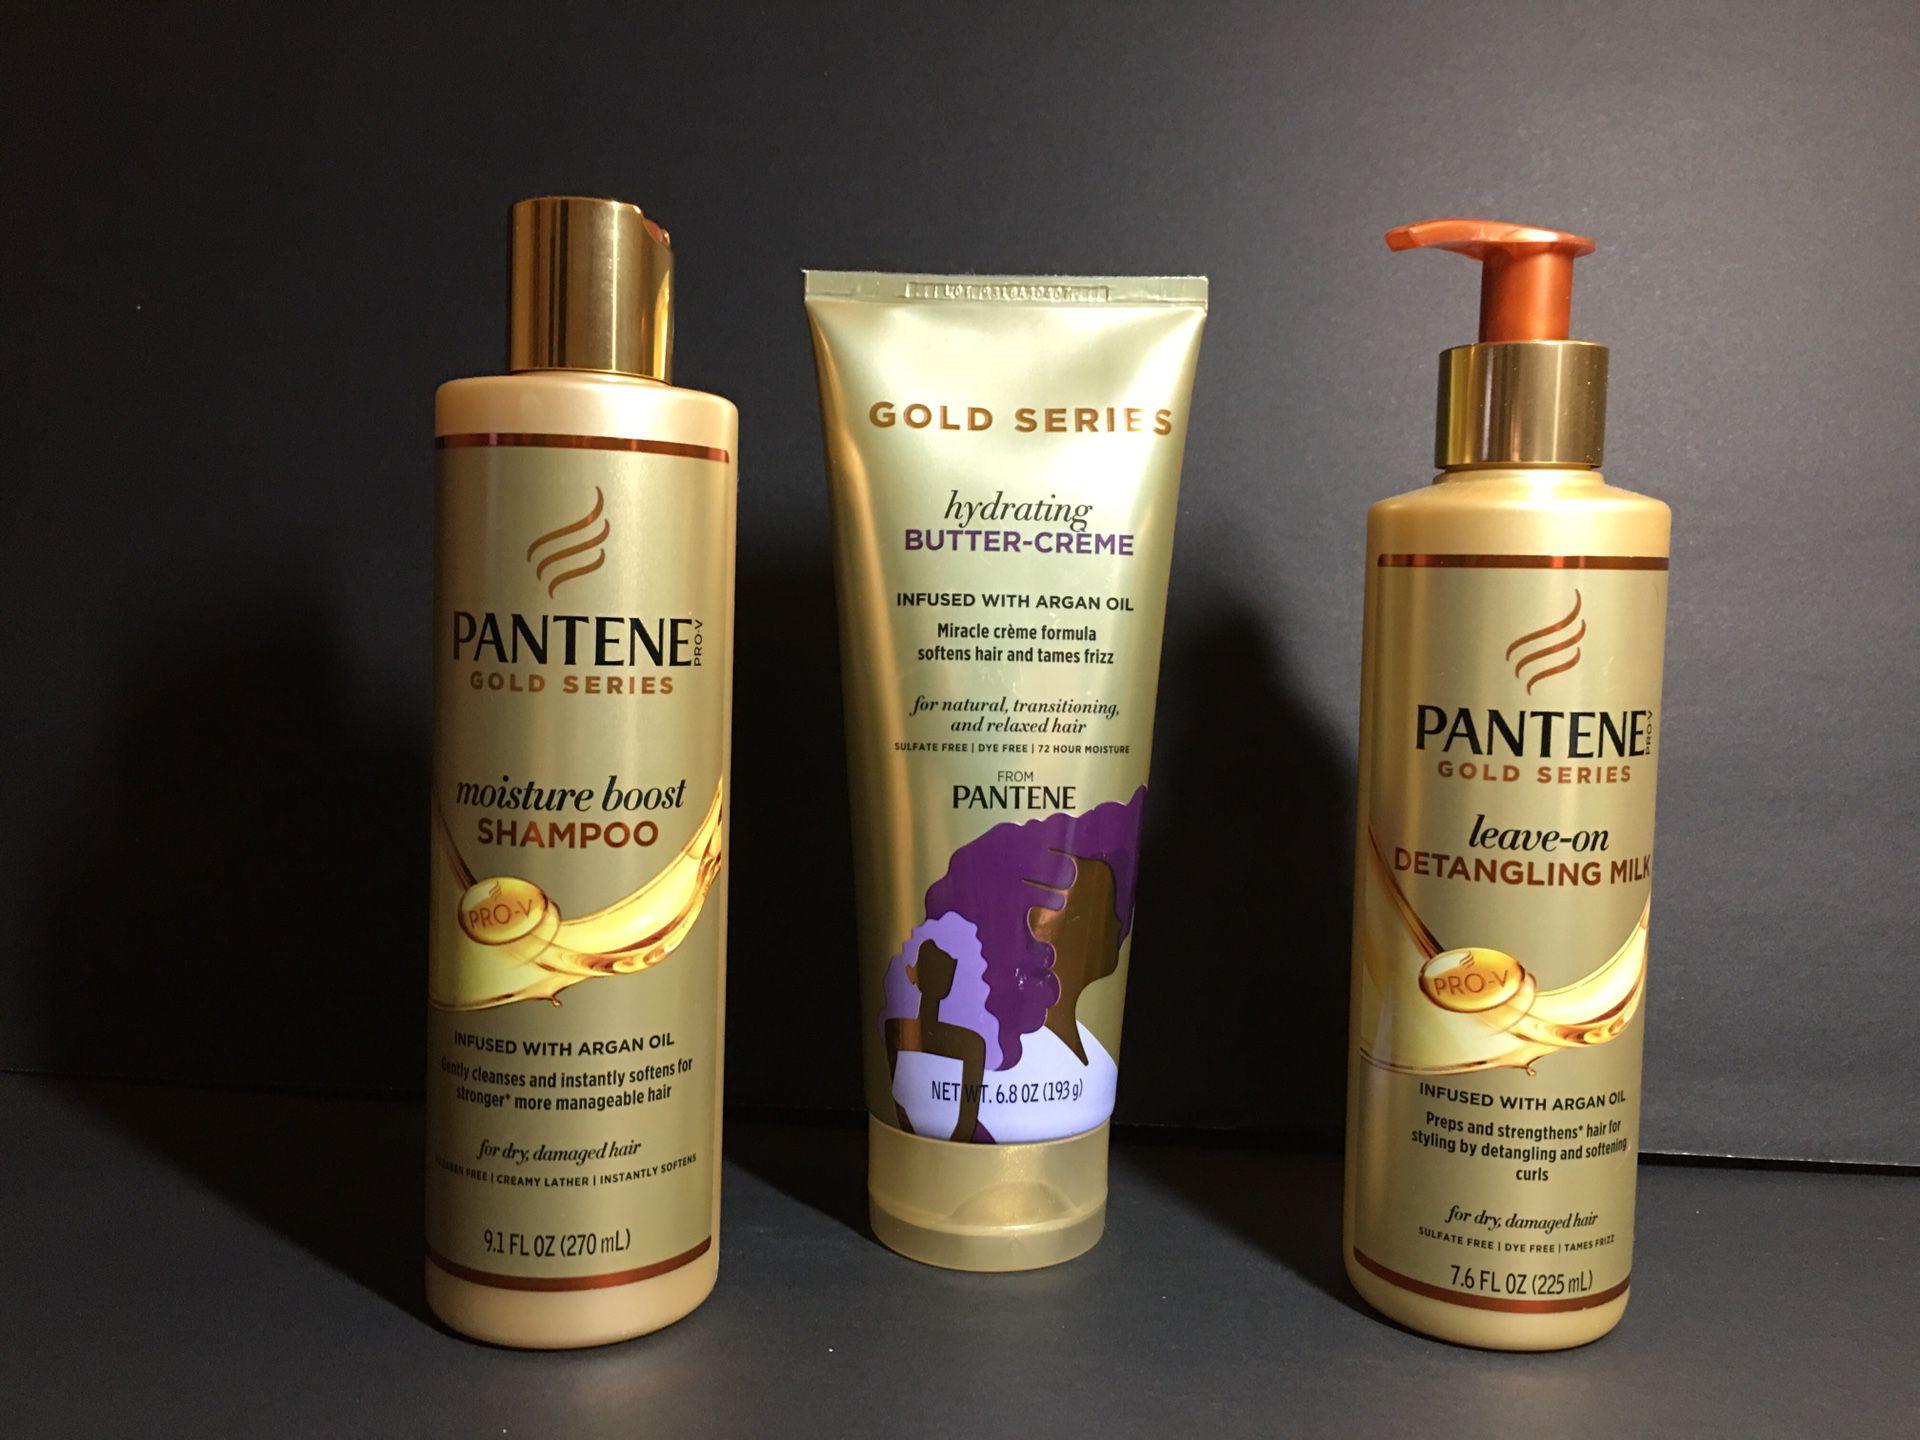 Lot of 3 Pantene Gold Series w/ Argan Oil